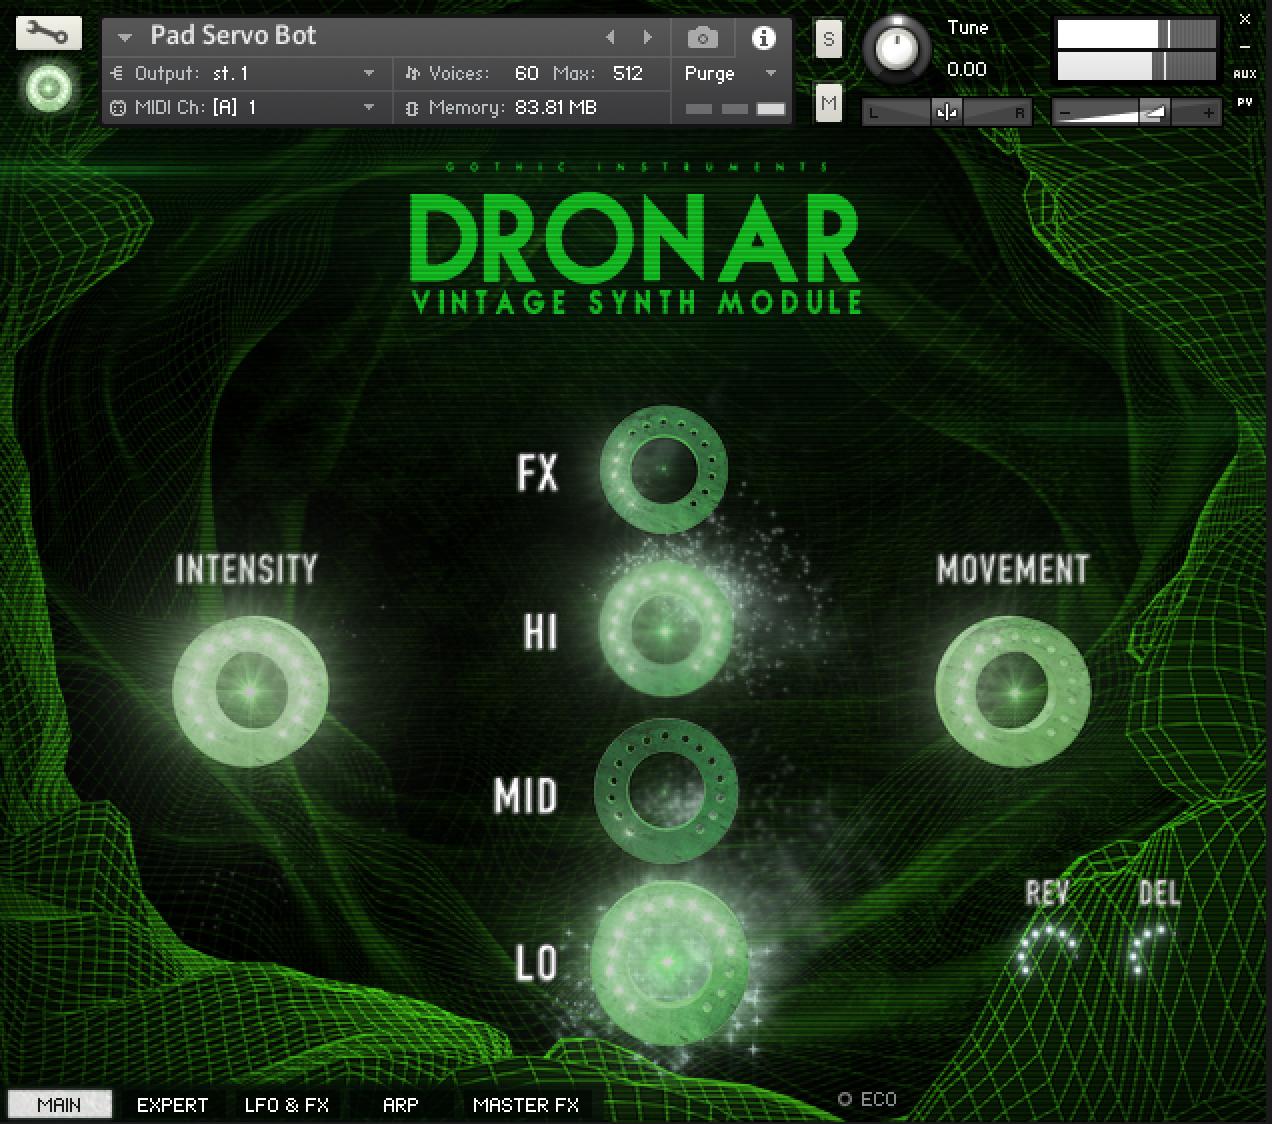 dronar vintage synth module